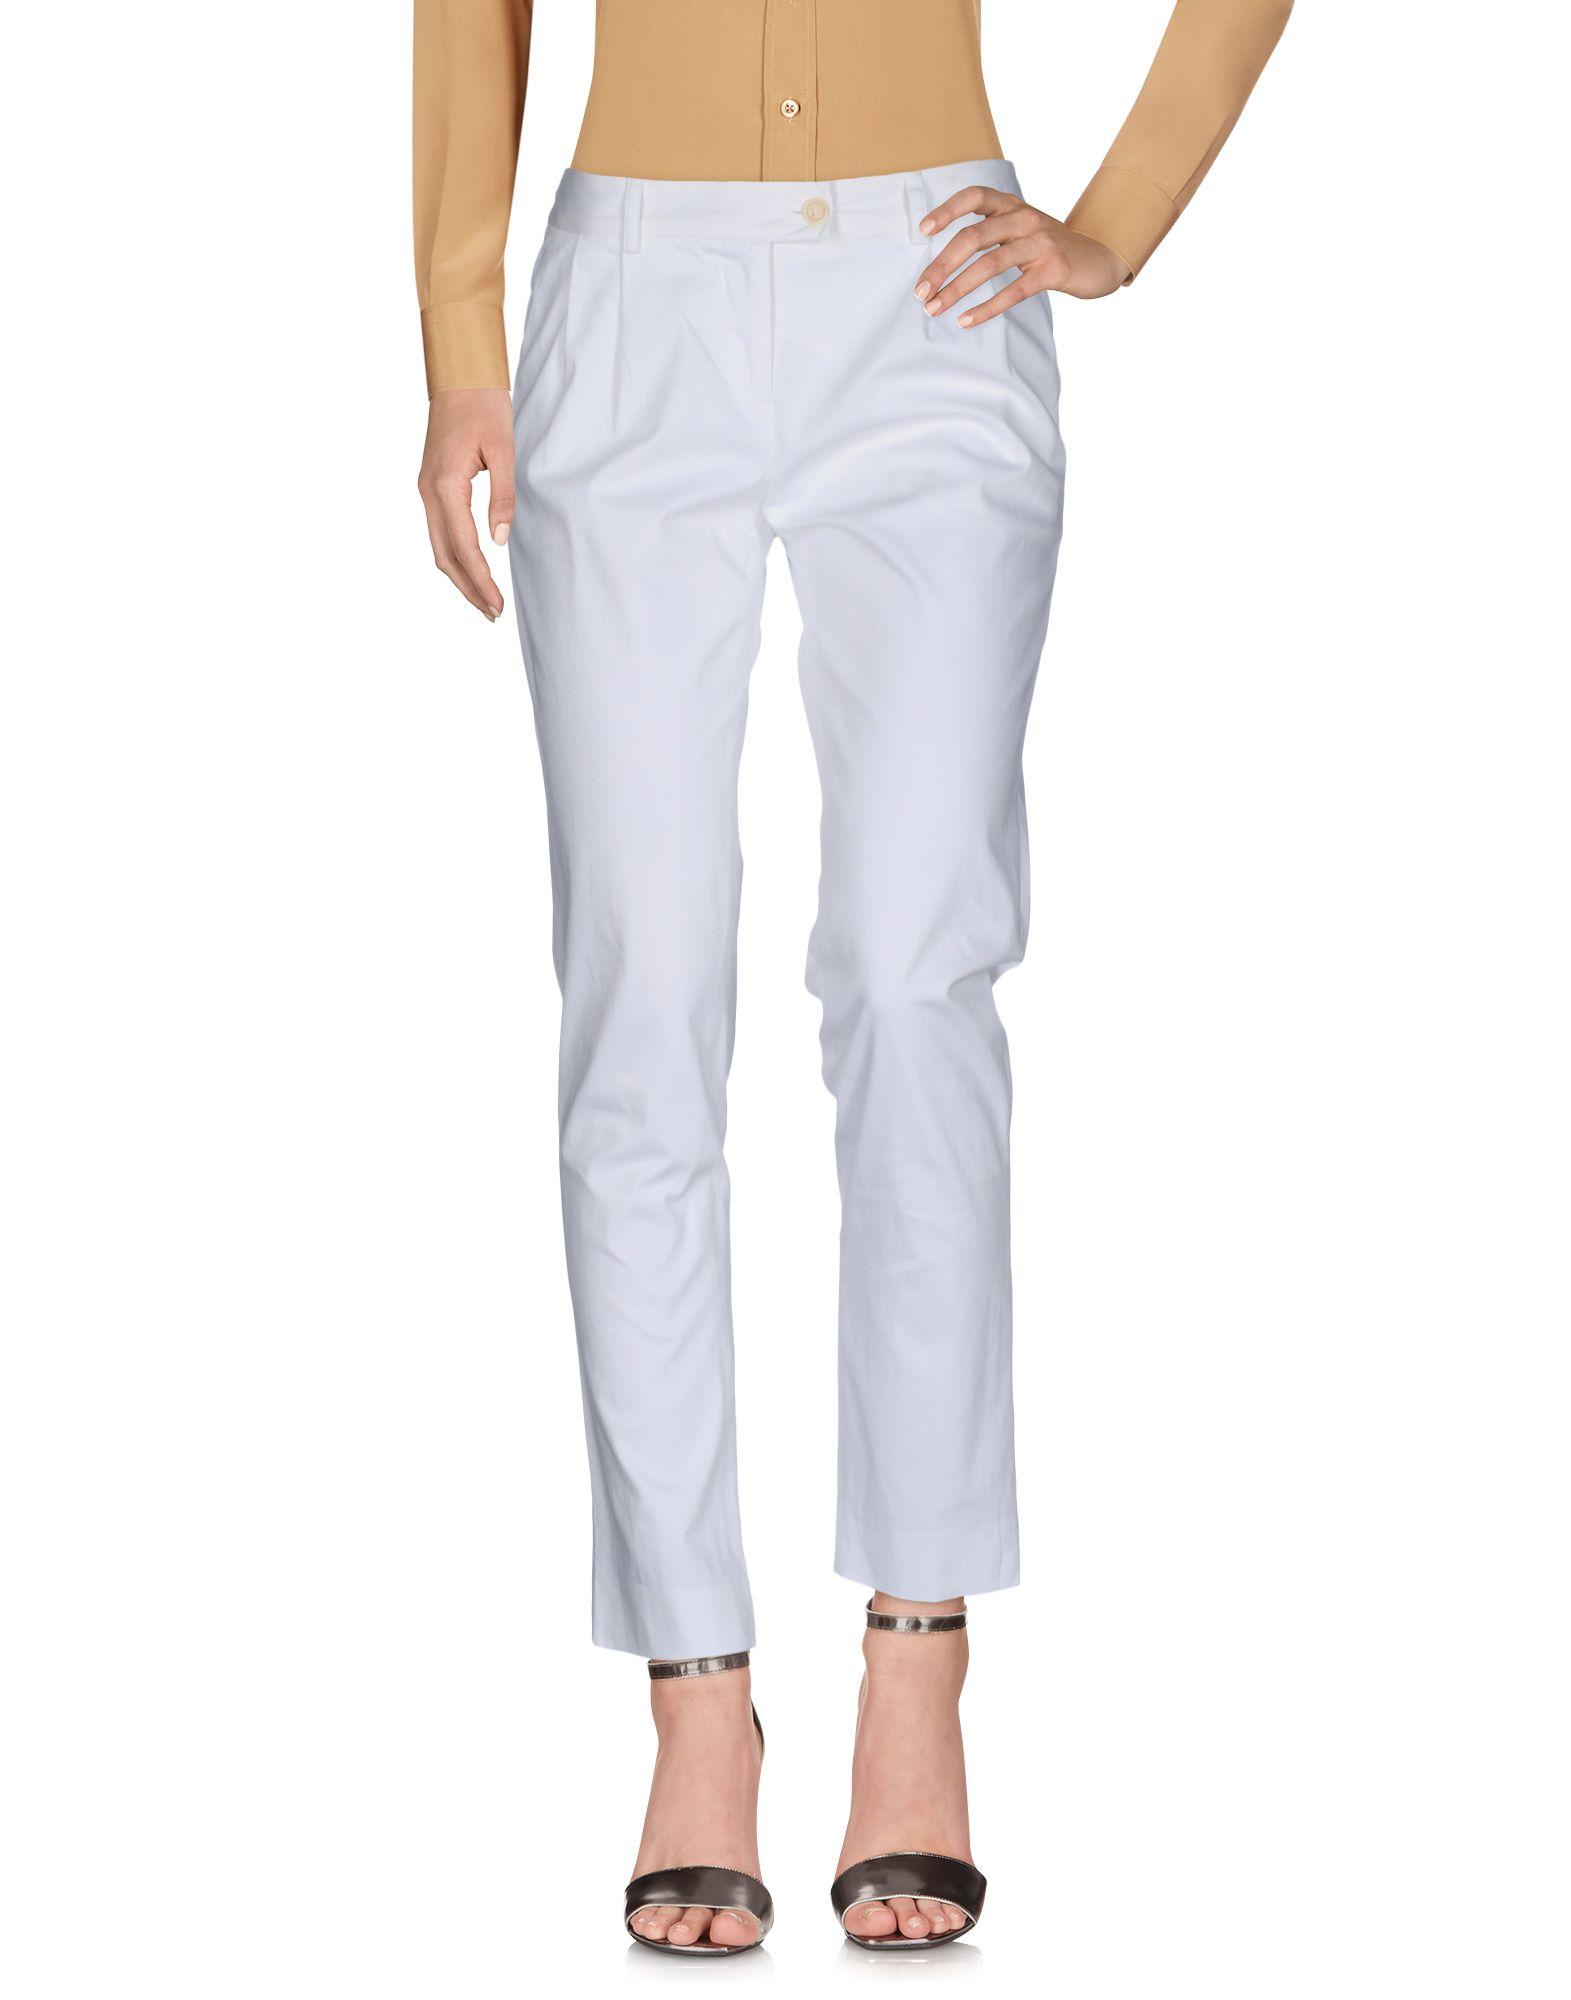 MOSCHINO CHEAP AND CHIC Повседневные брюки moschino брюки капри